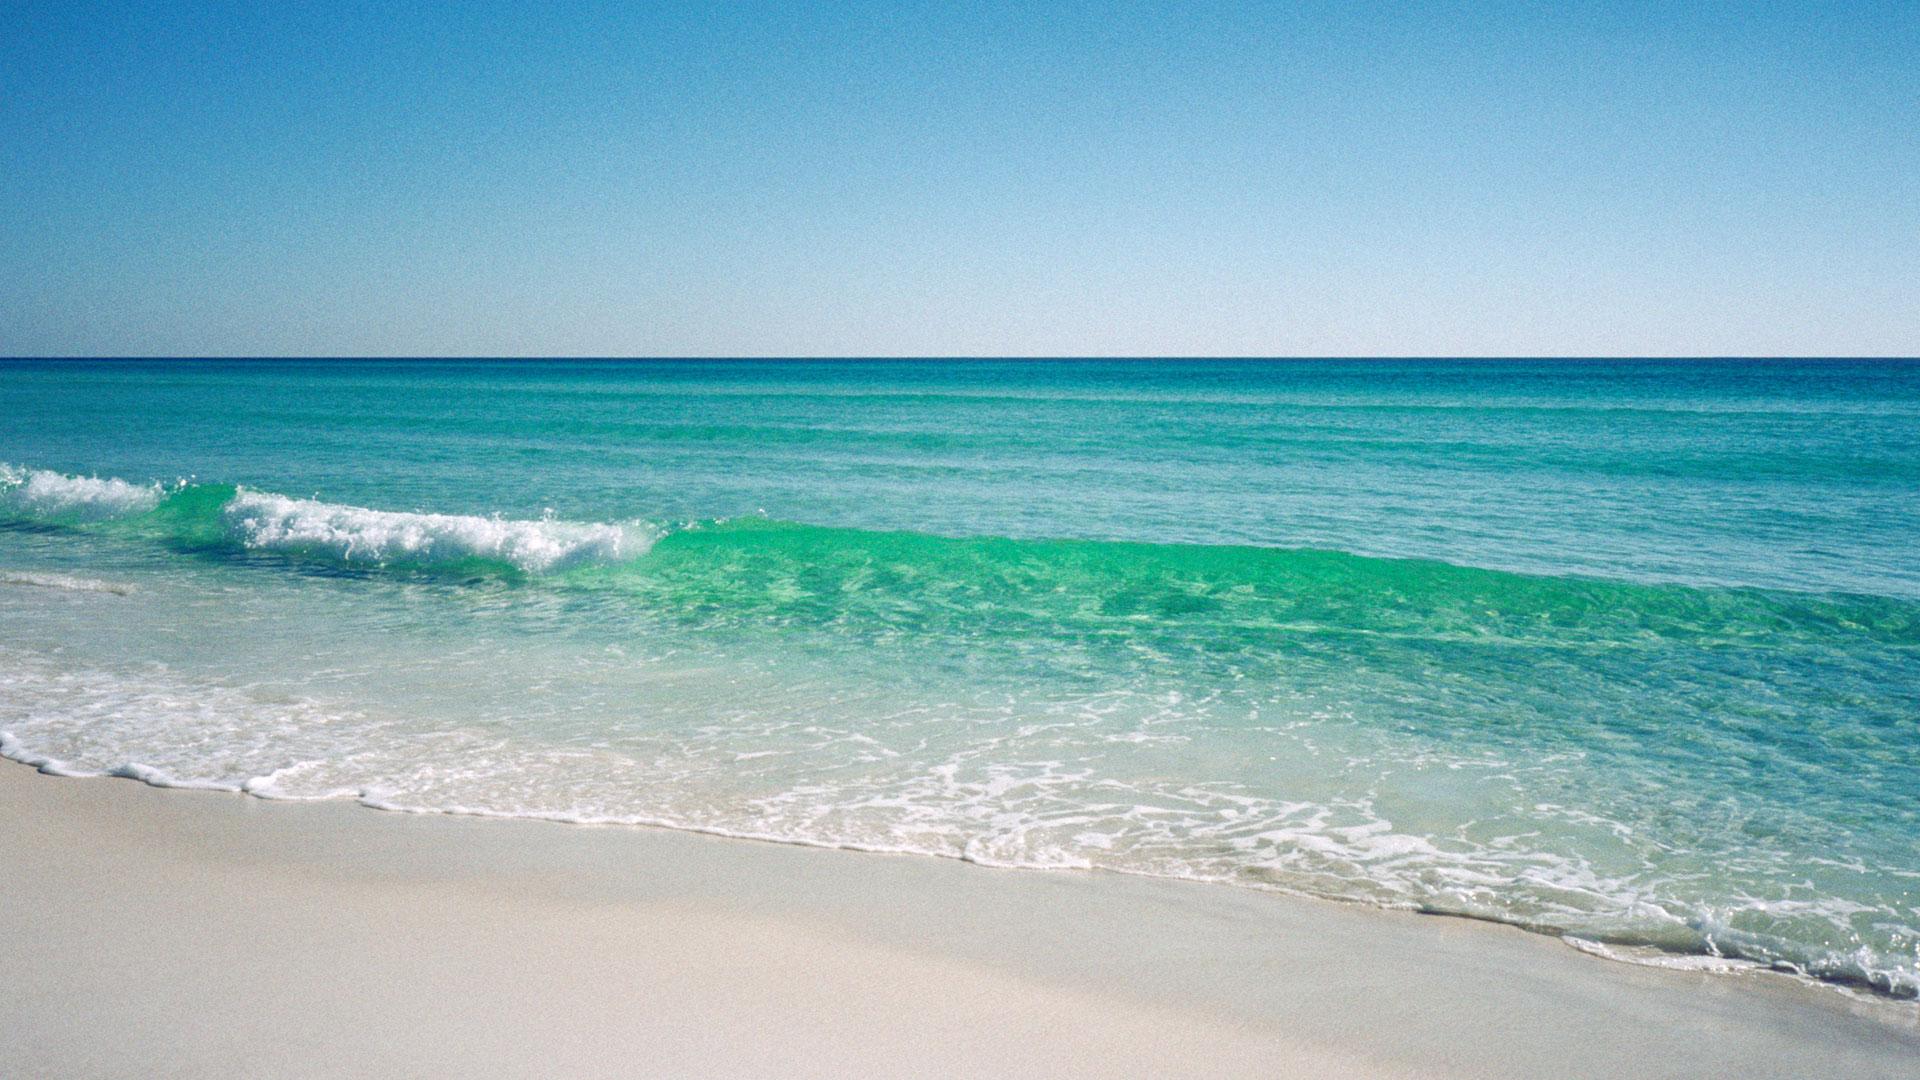 pictures coast beaches florida wallpaper scenic images desktop 1920x1080